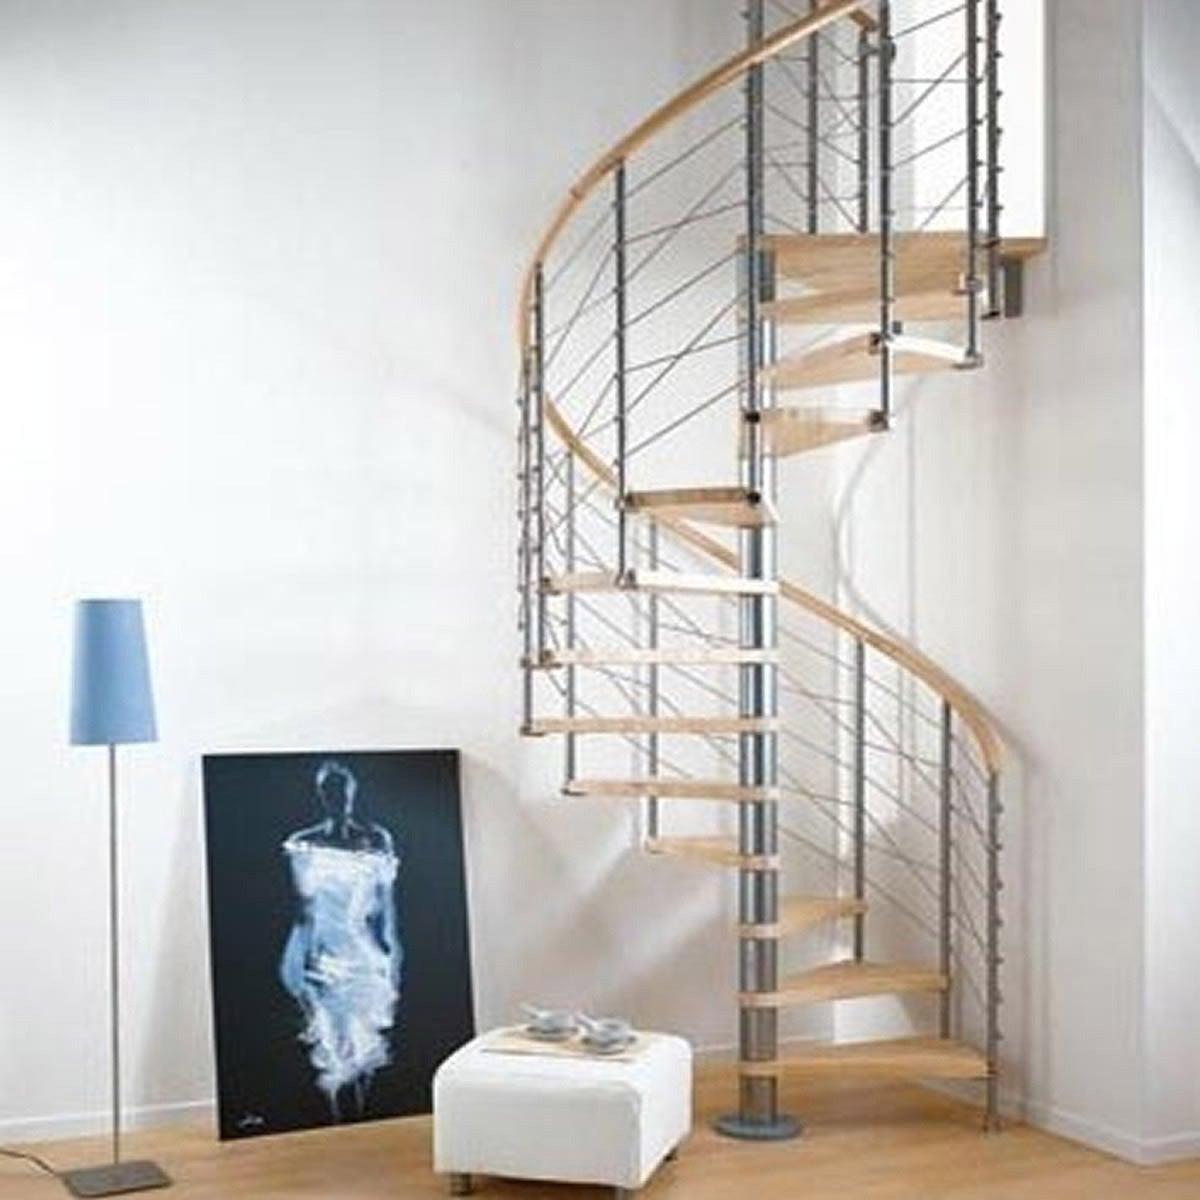 Escalier Colimacon Rond Ring Structure Metal Marche Bois Leroy Merlin